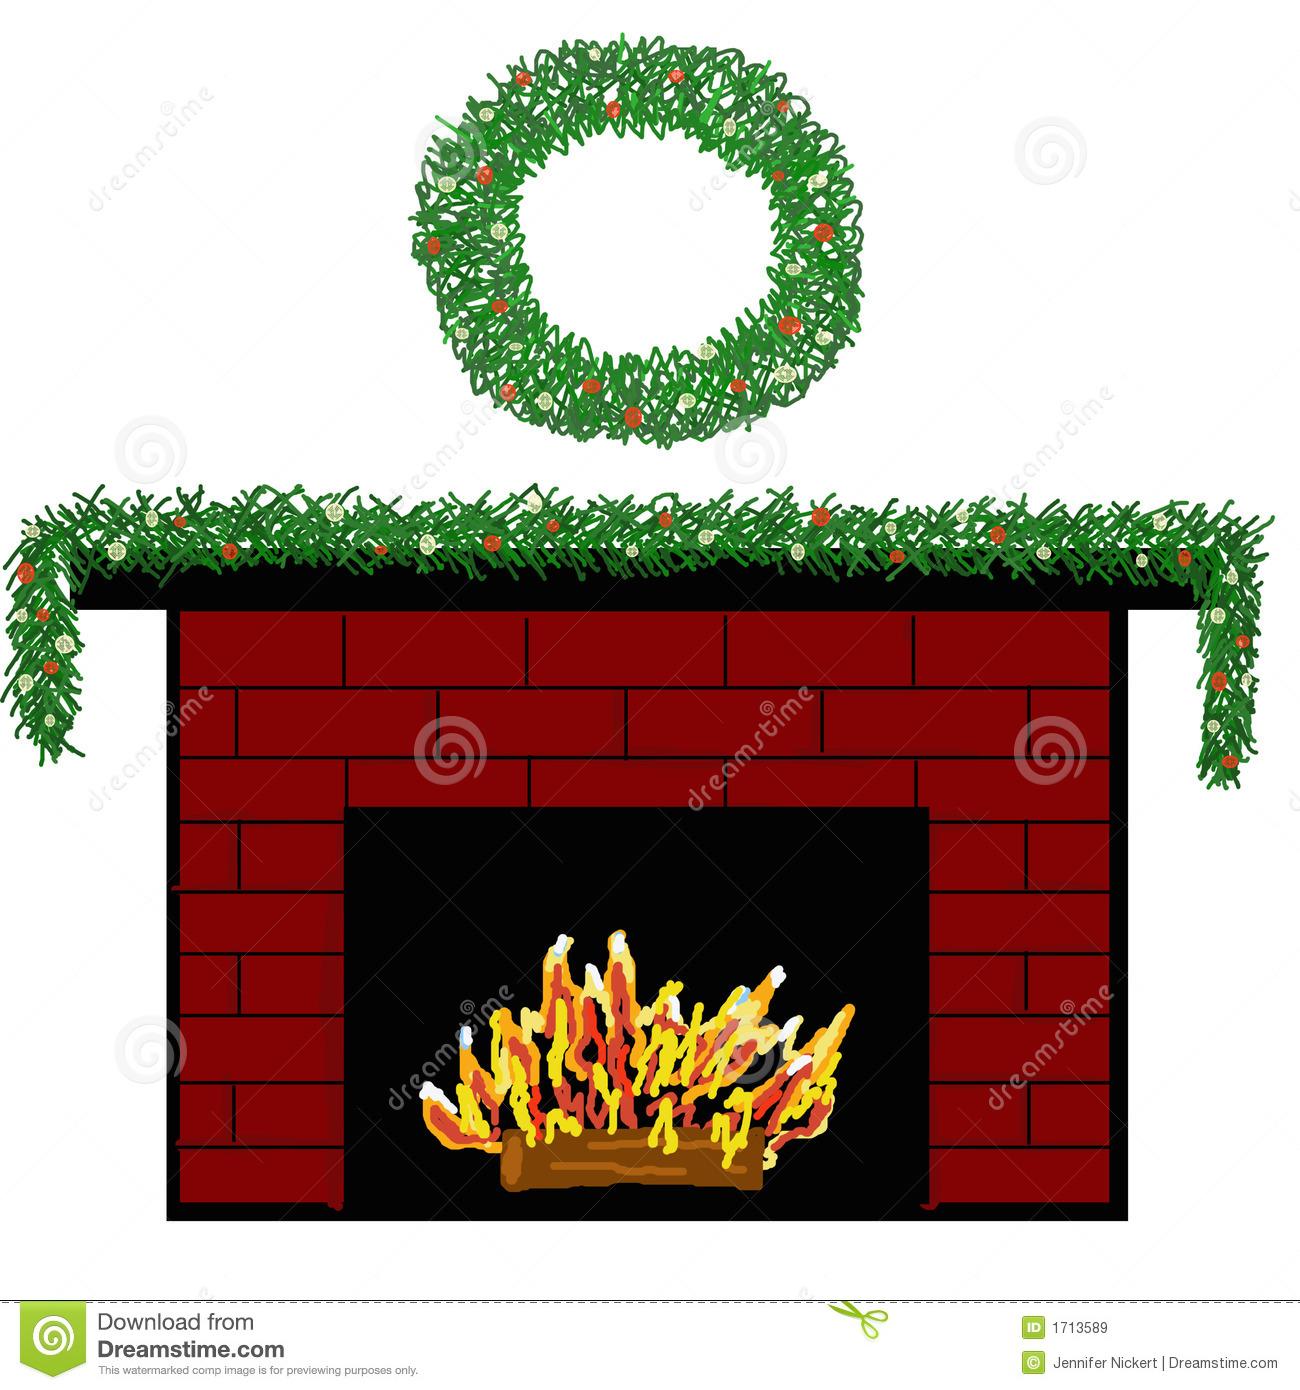 Brick clipart brick chimney Panda Images Brick Clipart brick%20fireplace%20clipart